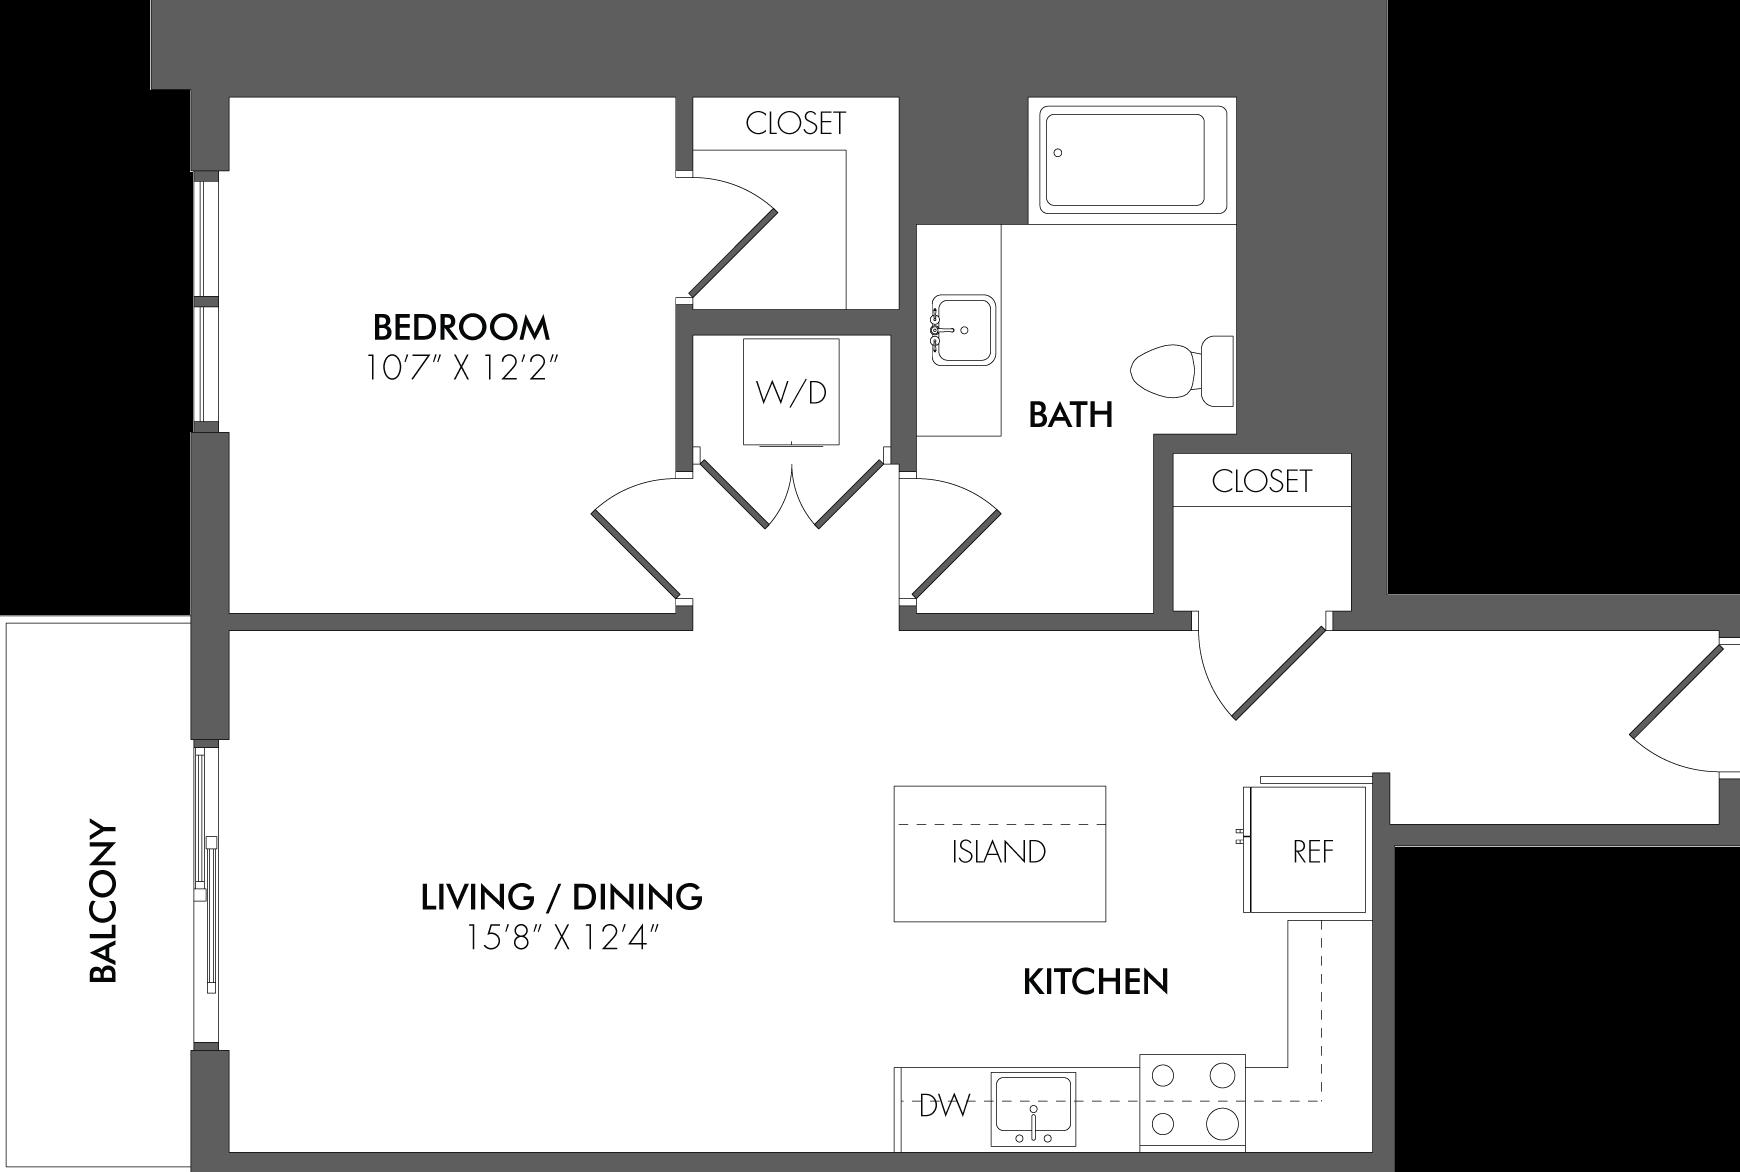 Apartment 2310 floorplan